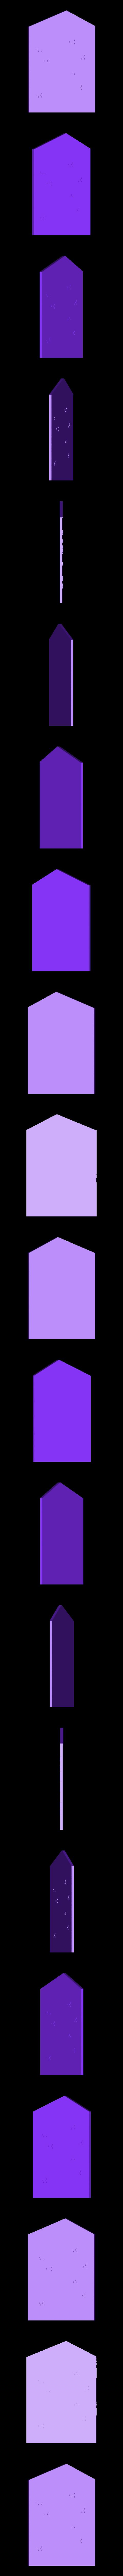 fun_side2.stl Download free STL file Ripper's London - Funeral Parlour / Shop • 3D print template, Earsling